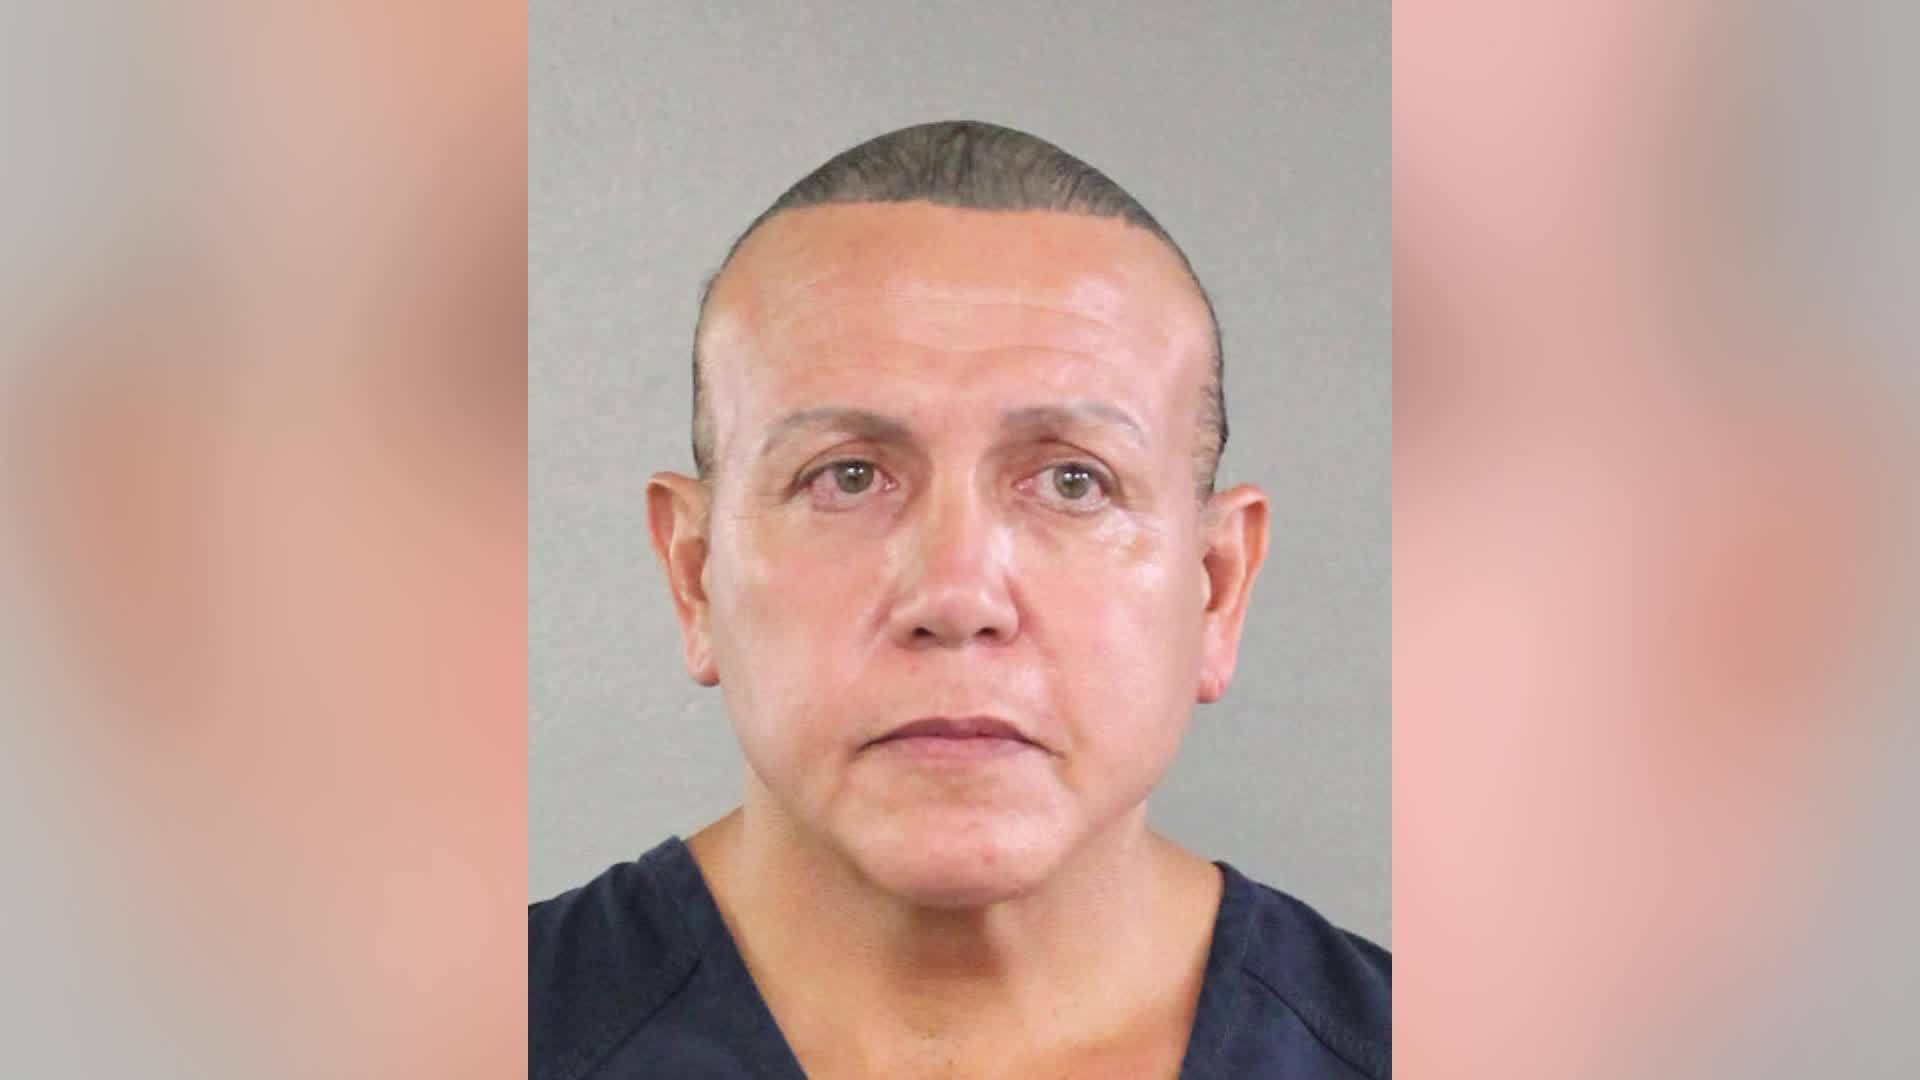 Cesar_Sayoc_arrested_in_bomb_threats_0_20181026175215